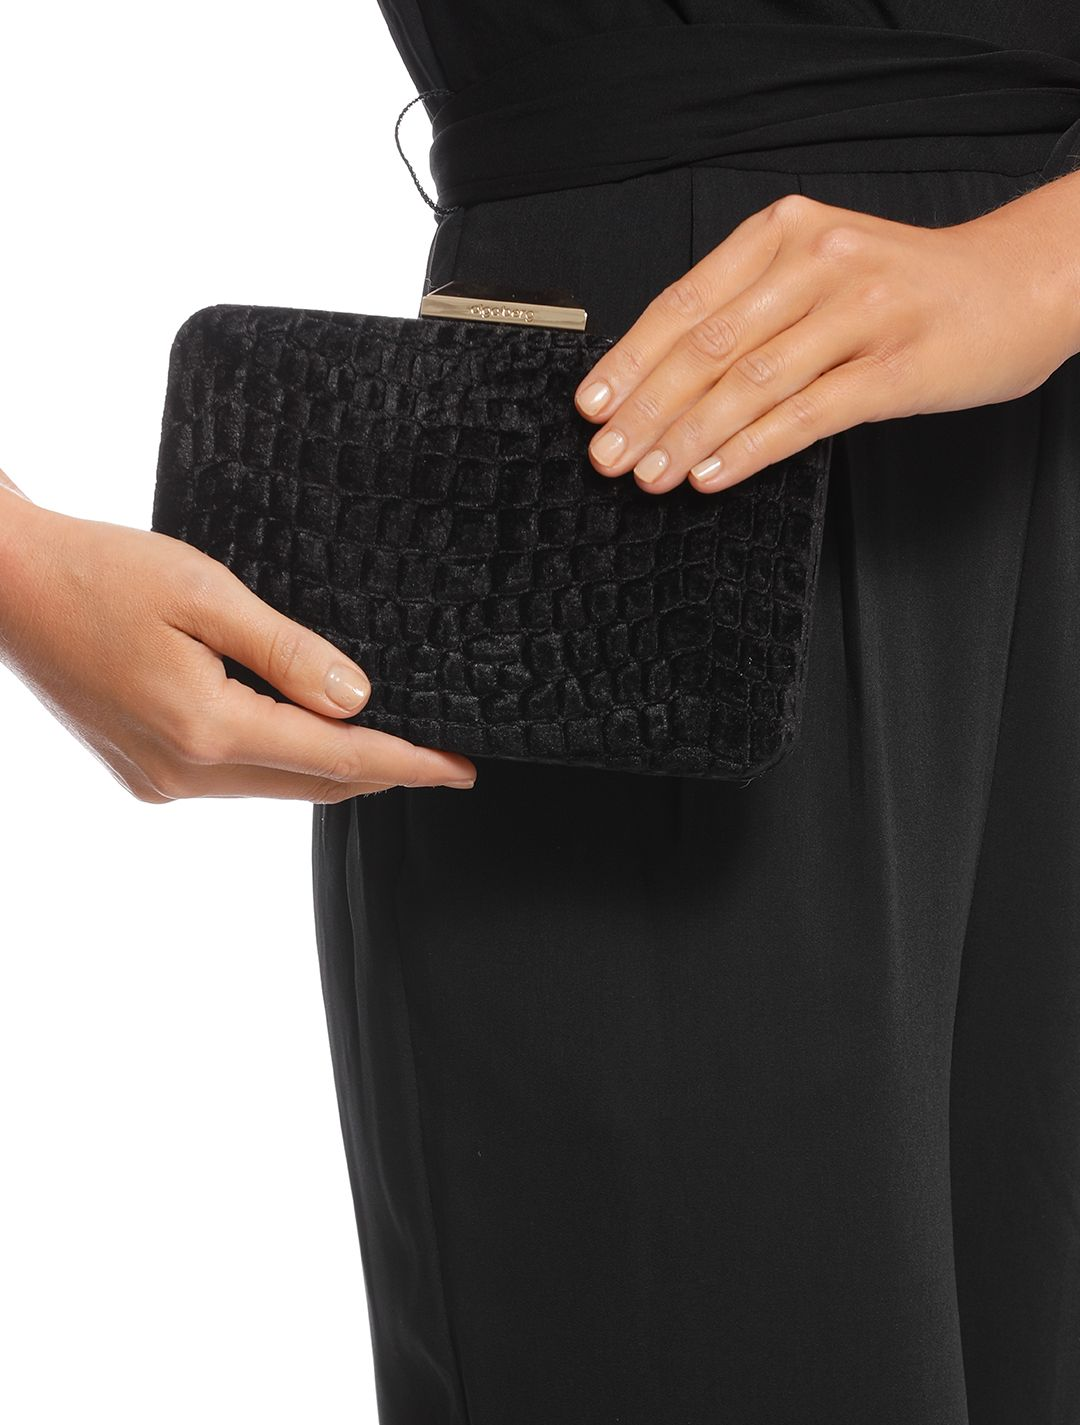 Olga Berg - Annalise Croc Embossed Velvet Clutch - Black - Product